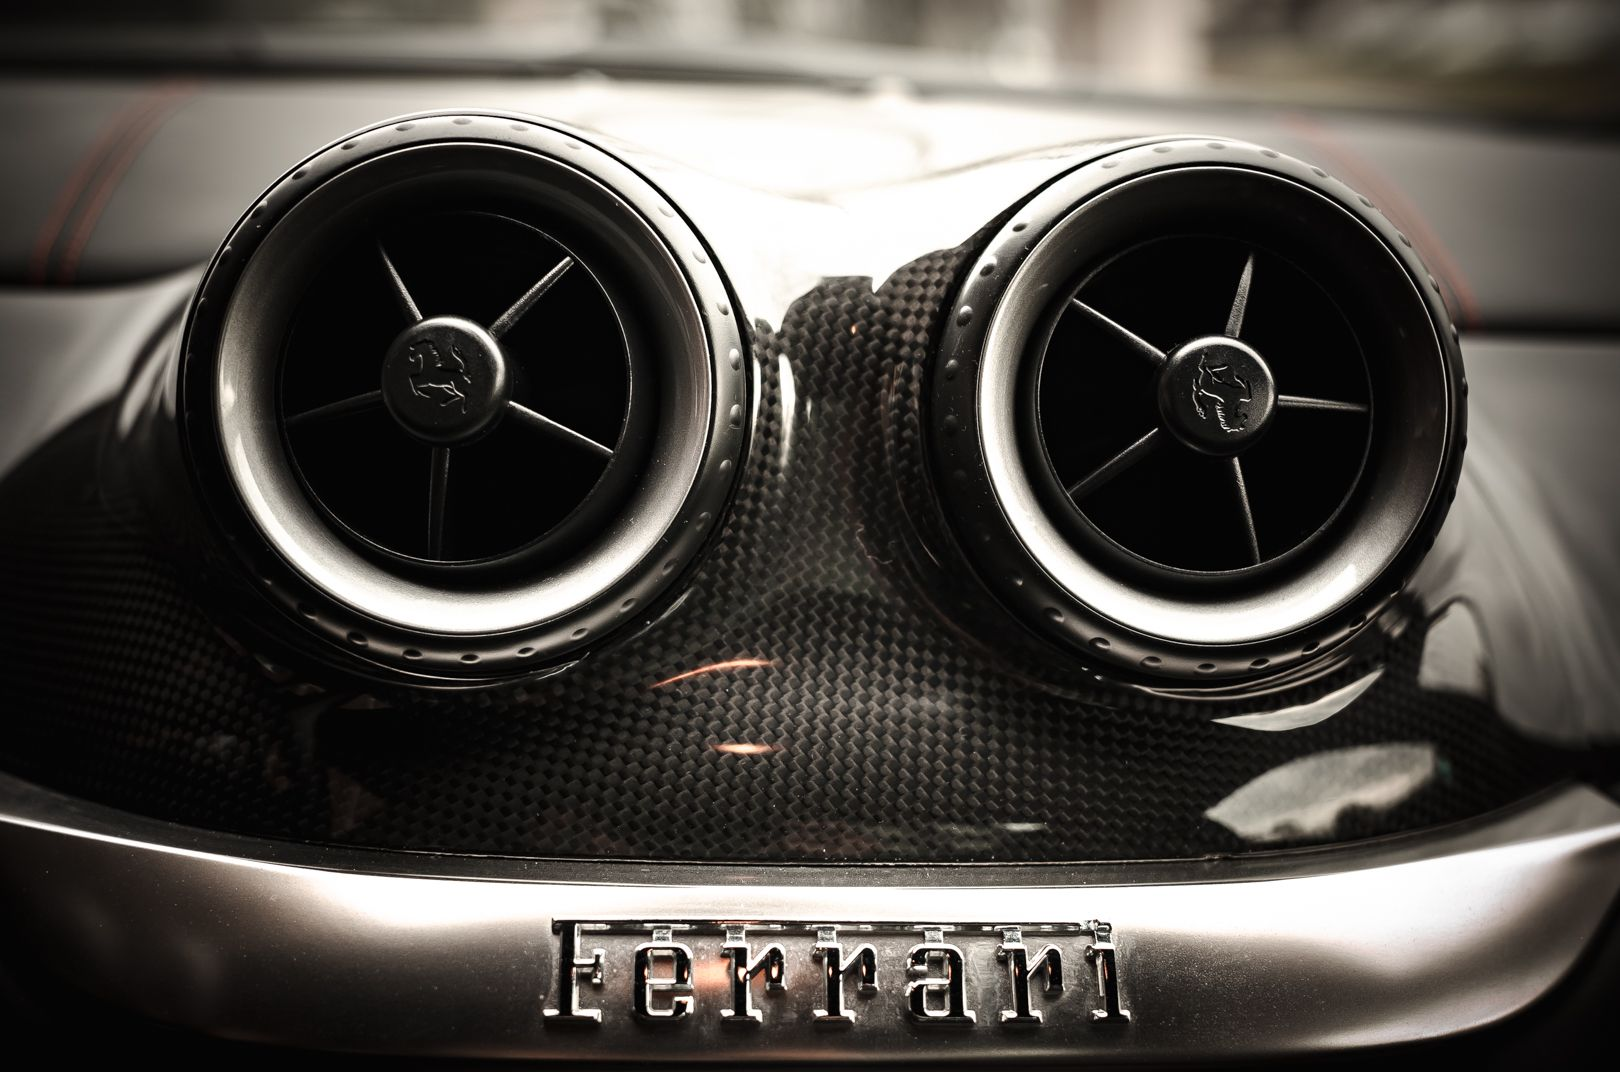 2007 Ferrari 599 GTB Fiorano 65017